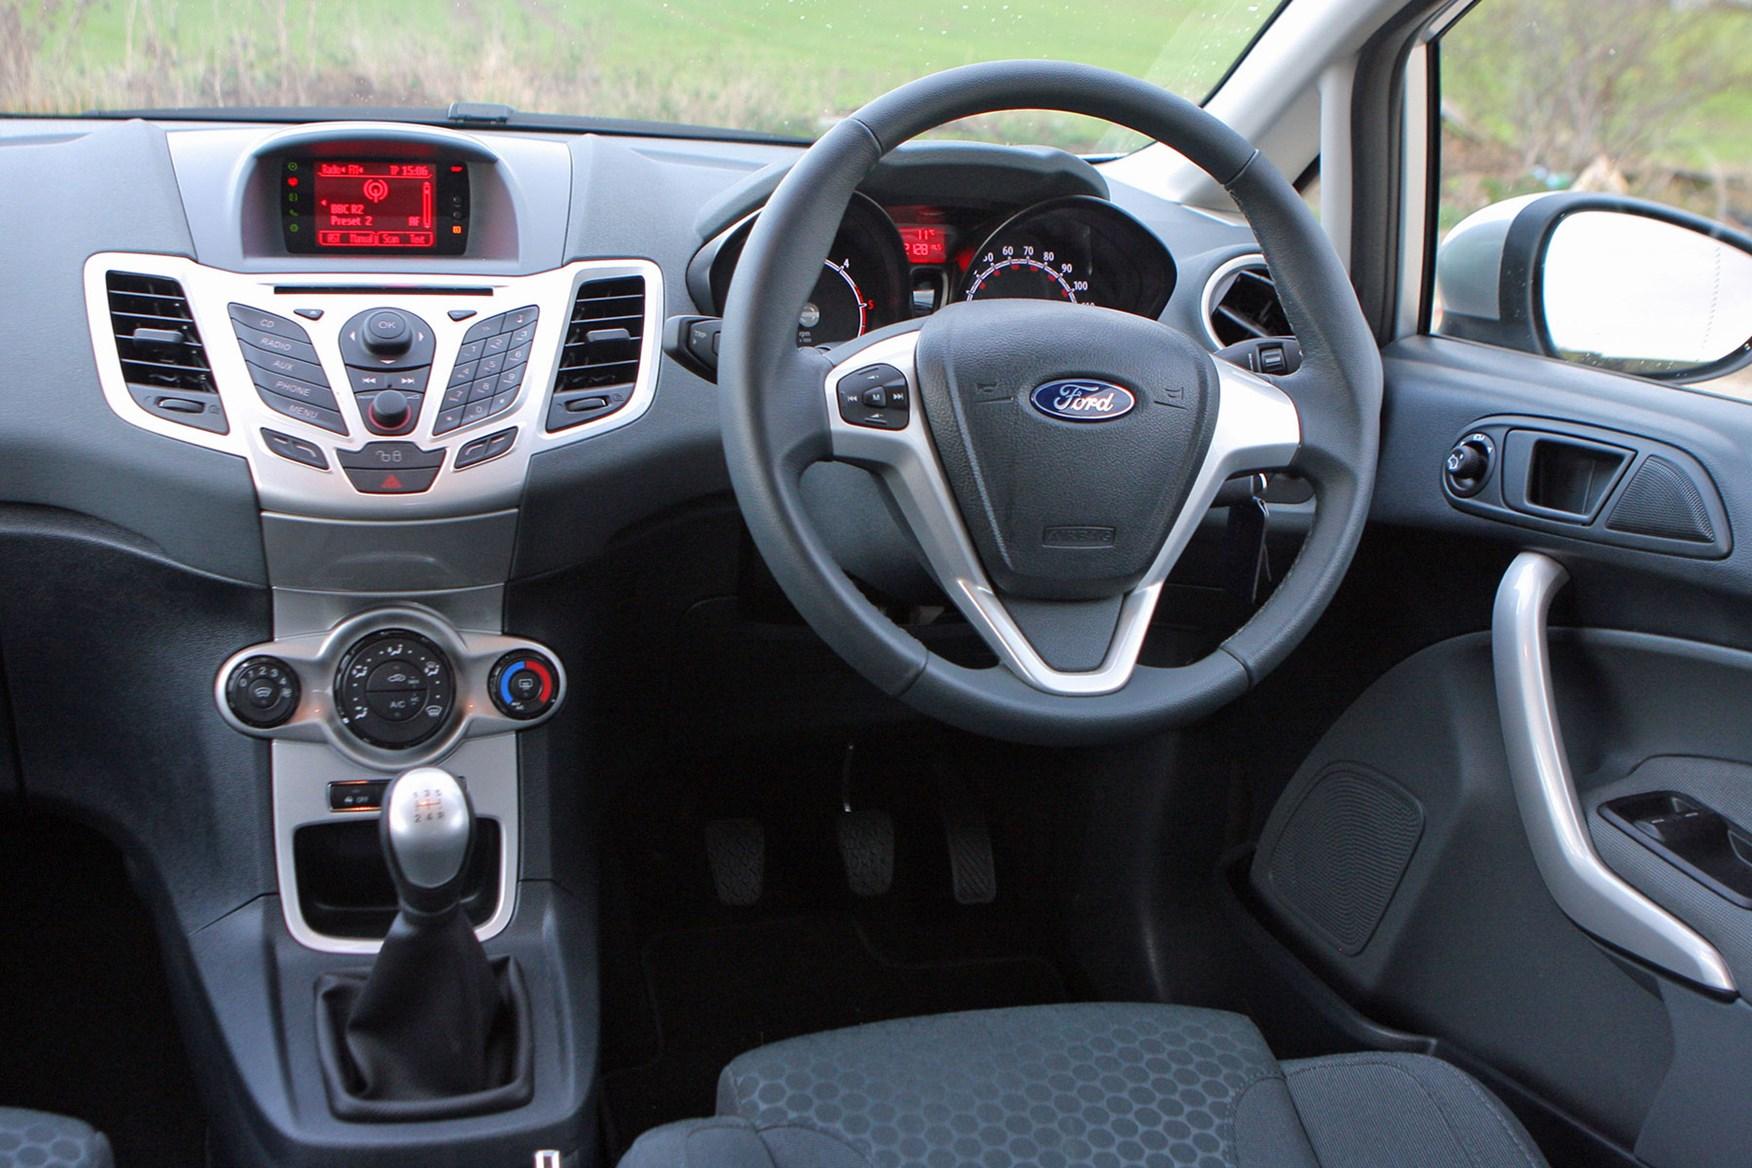 Ford Fiesta Van (2009-2017) cab interior